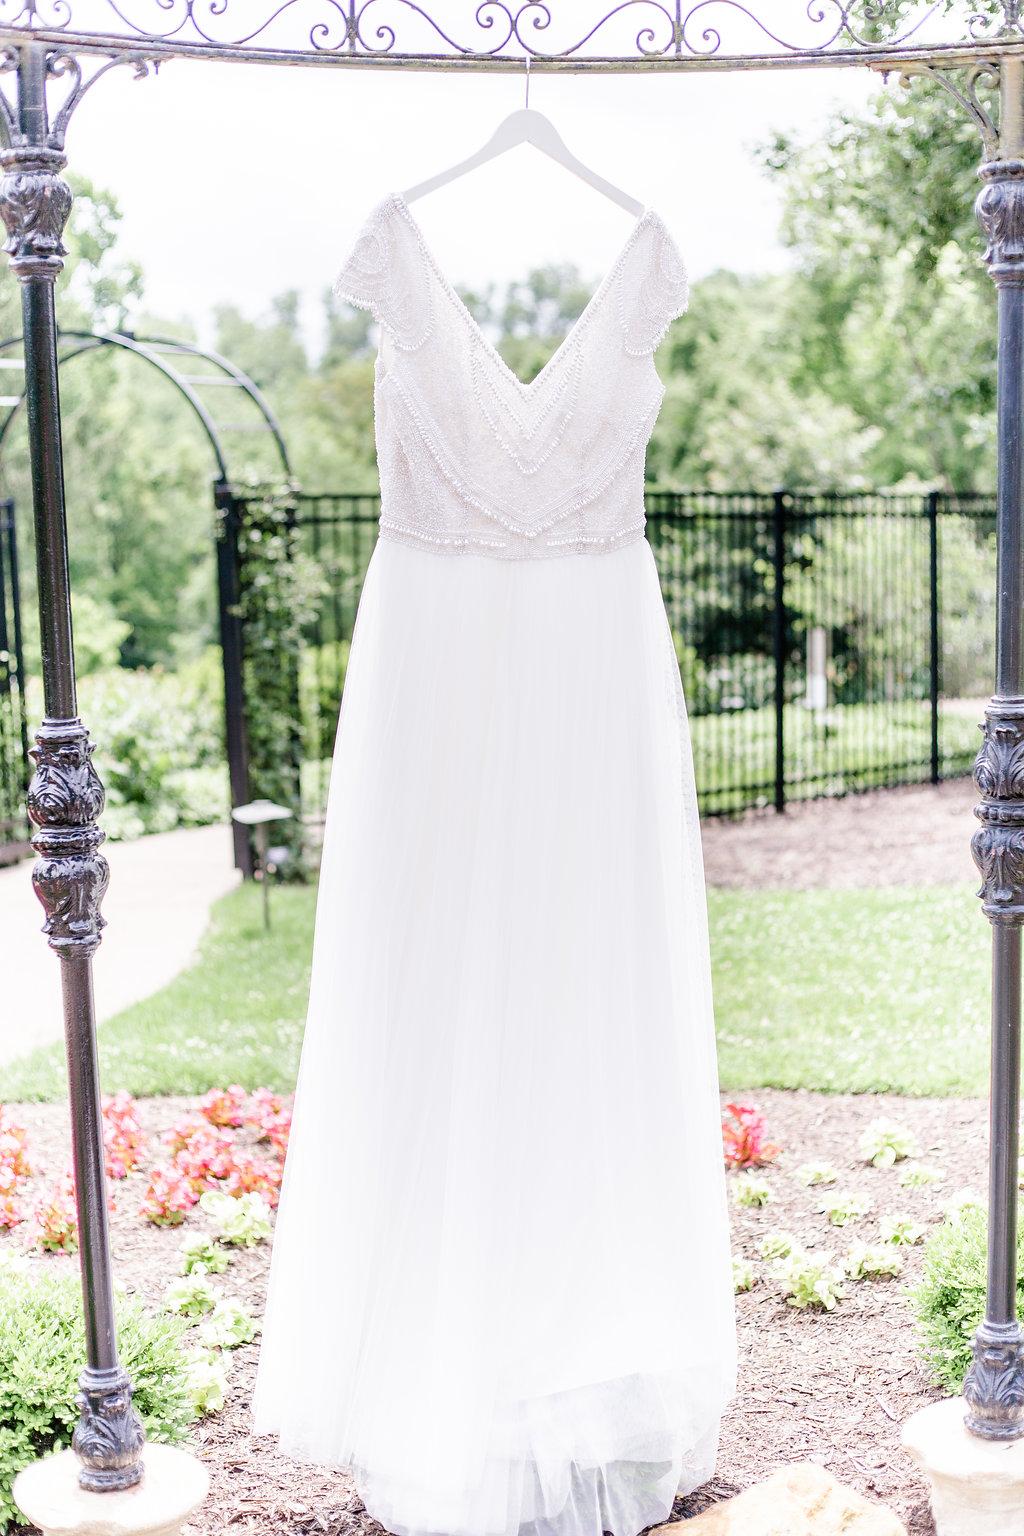 Theia_wedding_gown_Nima_blanc_de_blanc_pittsburgh_summer_garden_wedding_Bespoke_and_beloved_events